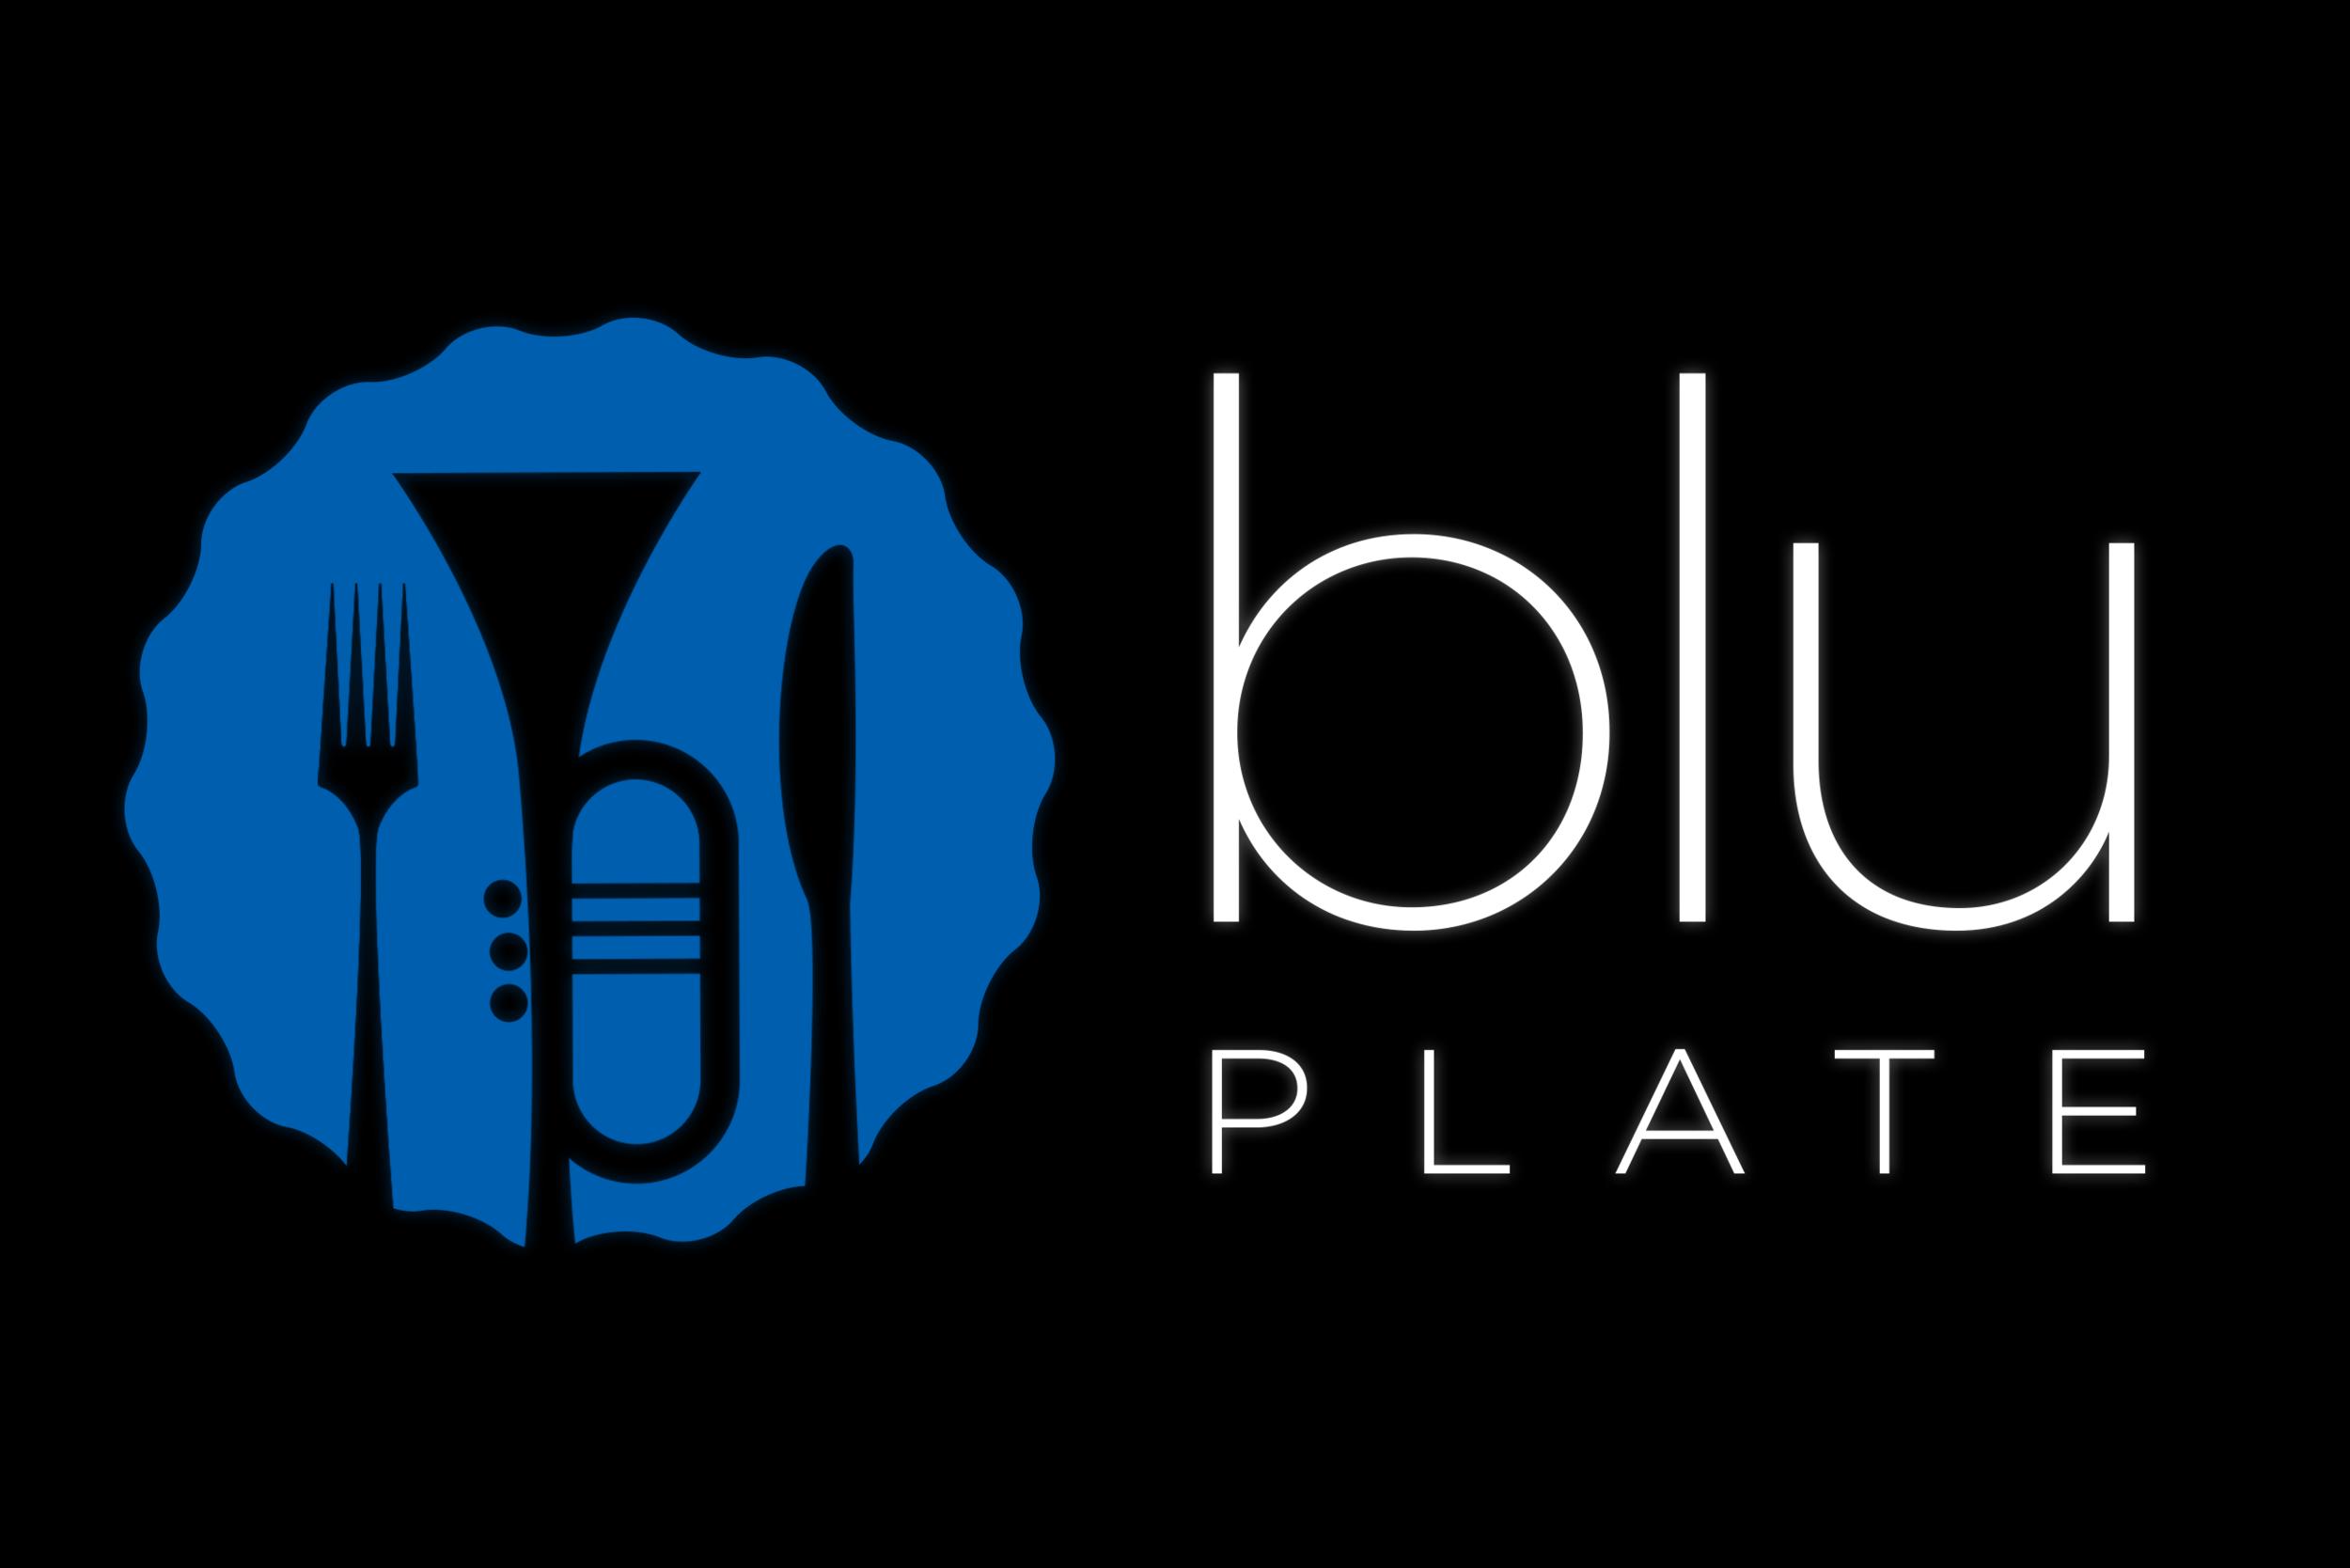 BLU_PLATE.png